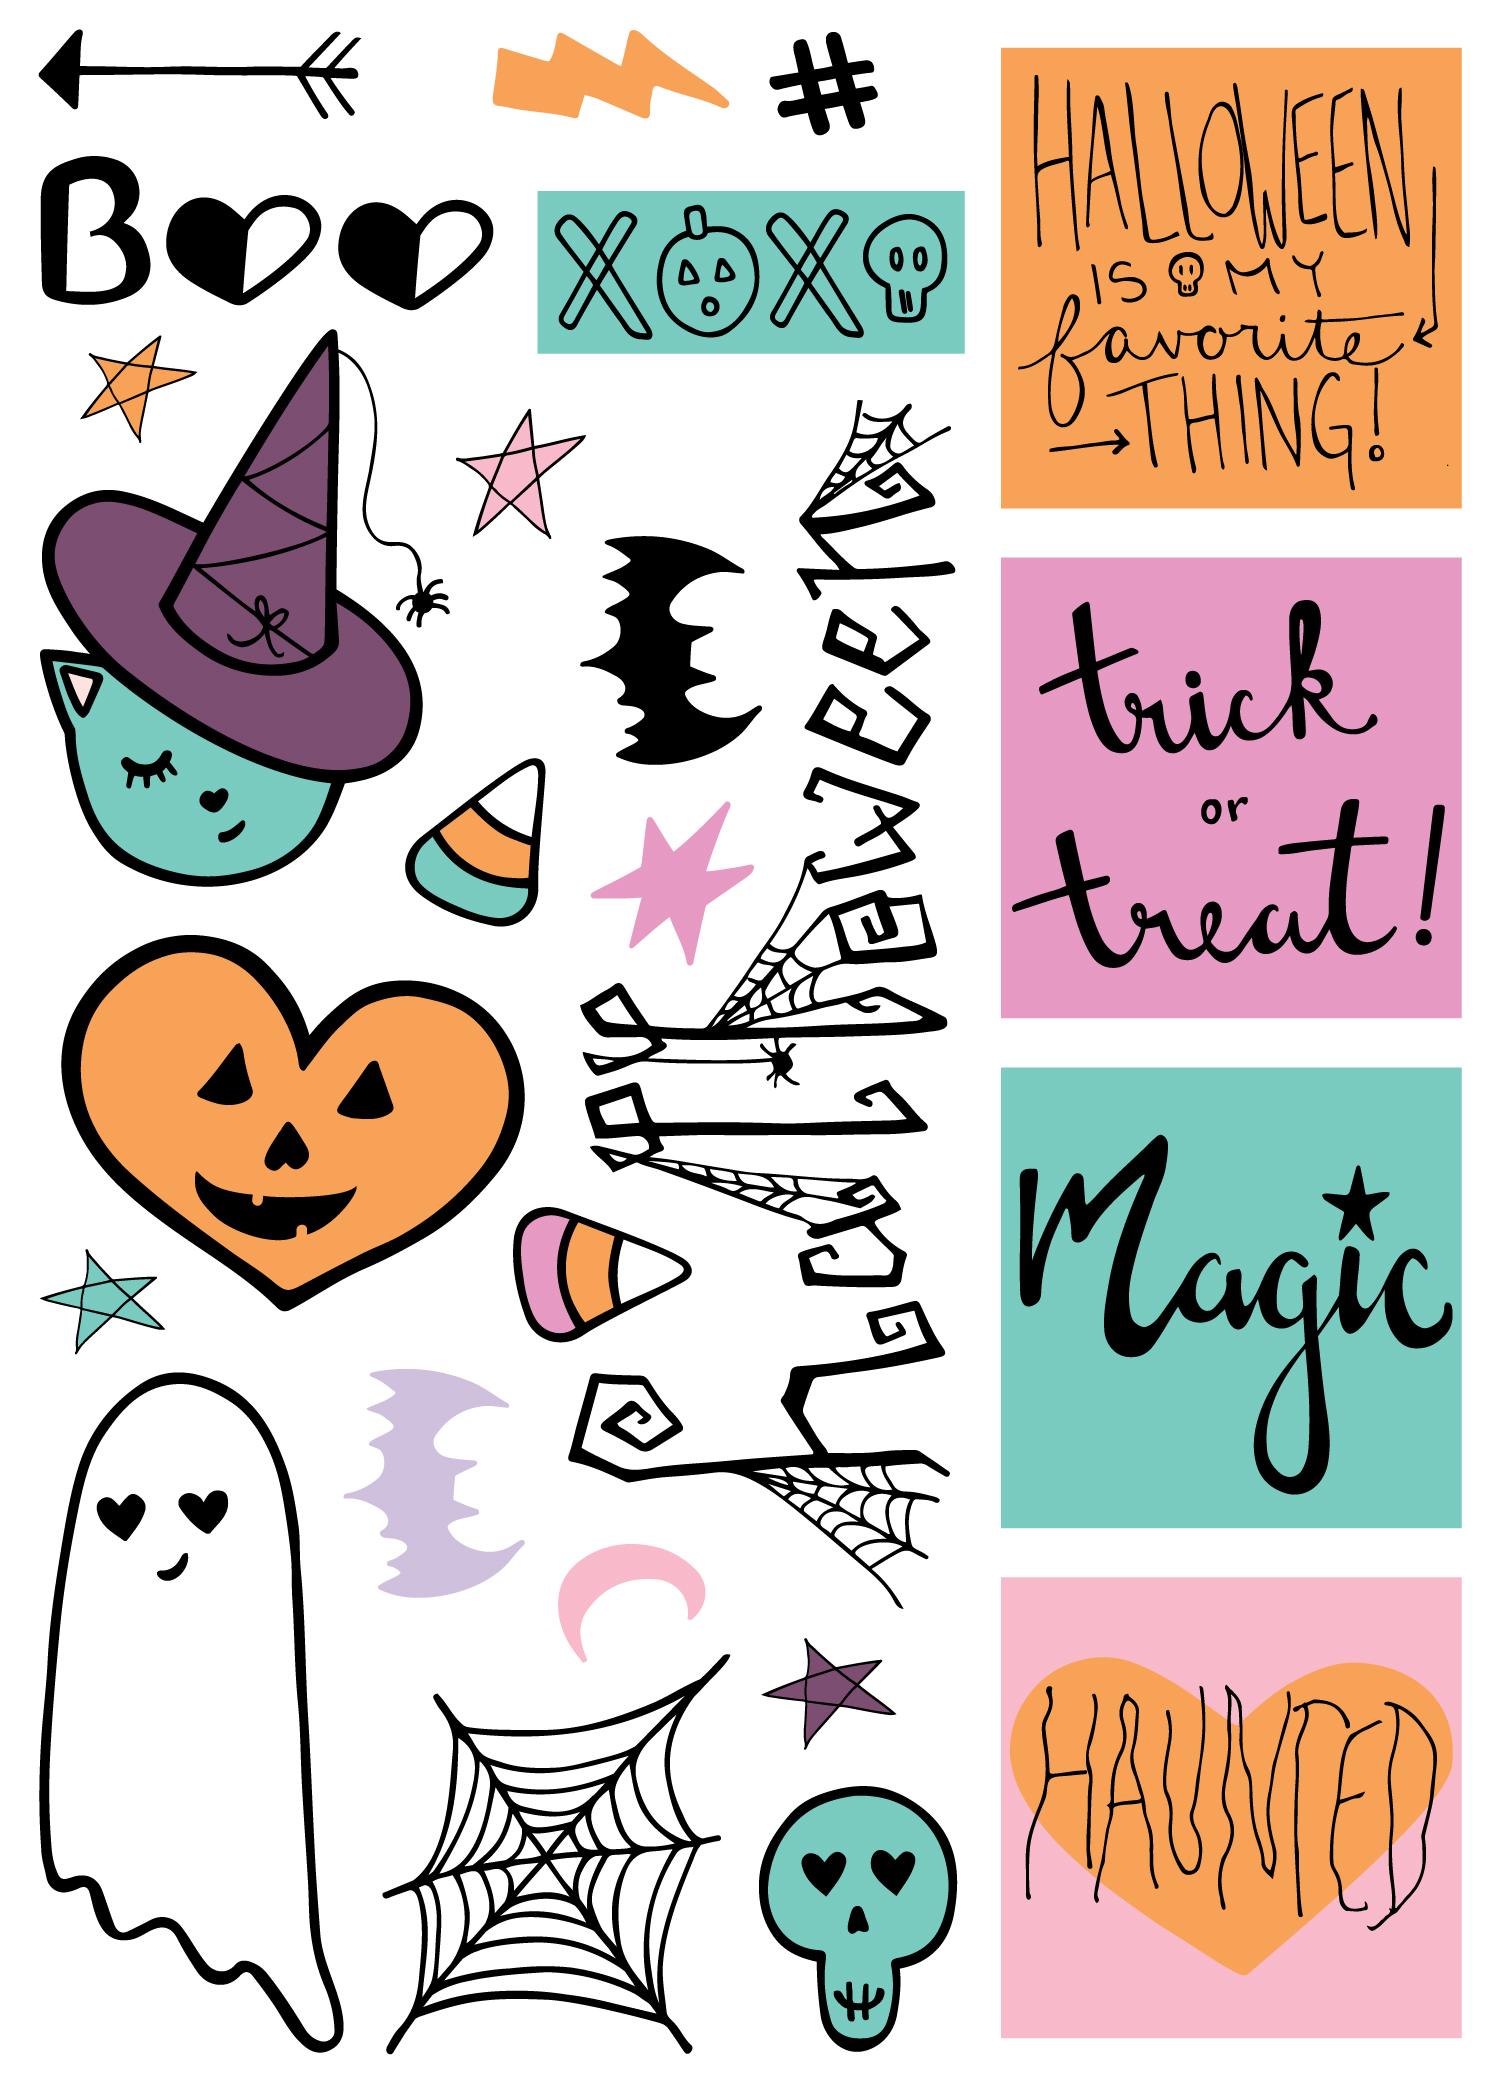 This is Halloween - Digital - Sticker Sheet 1 copy.jpg